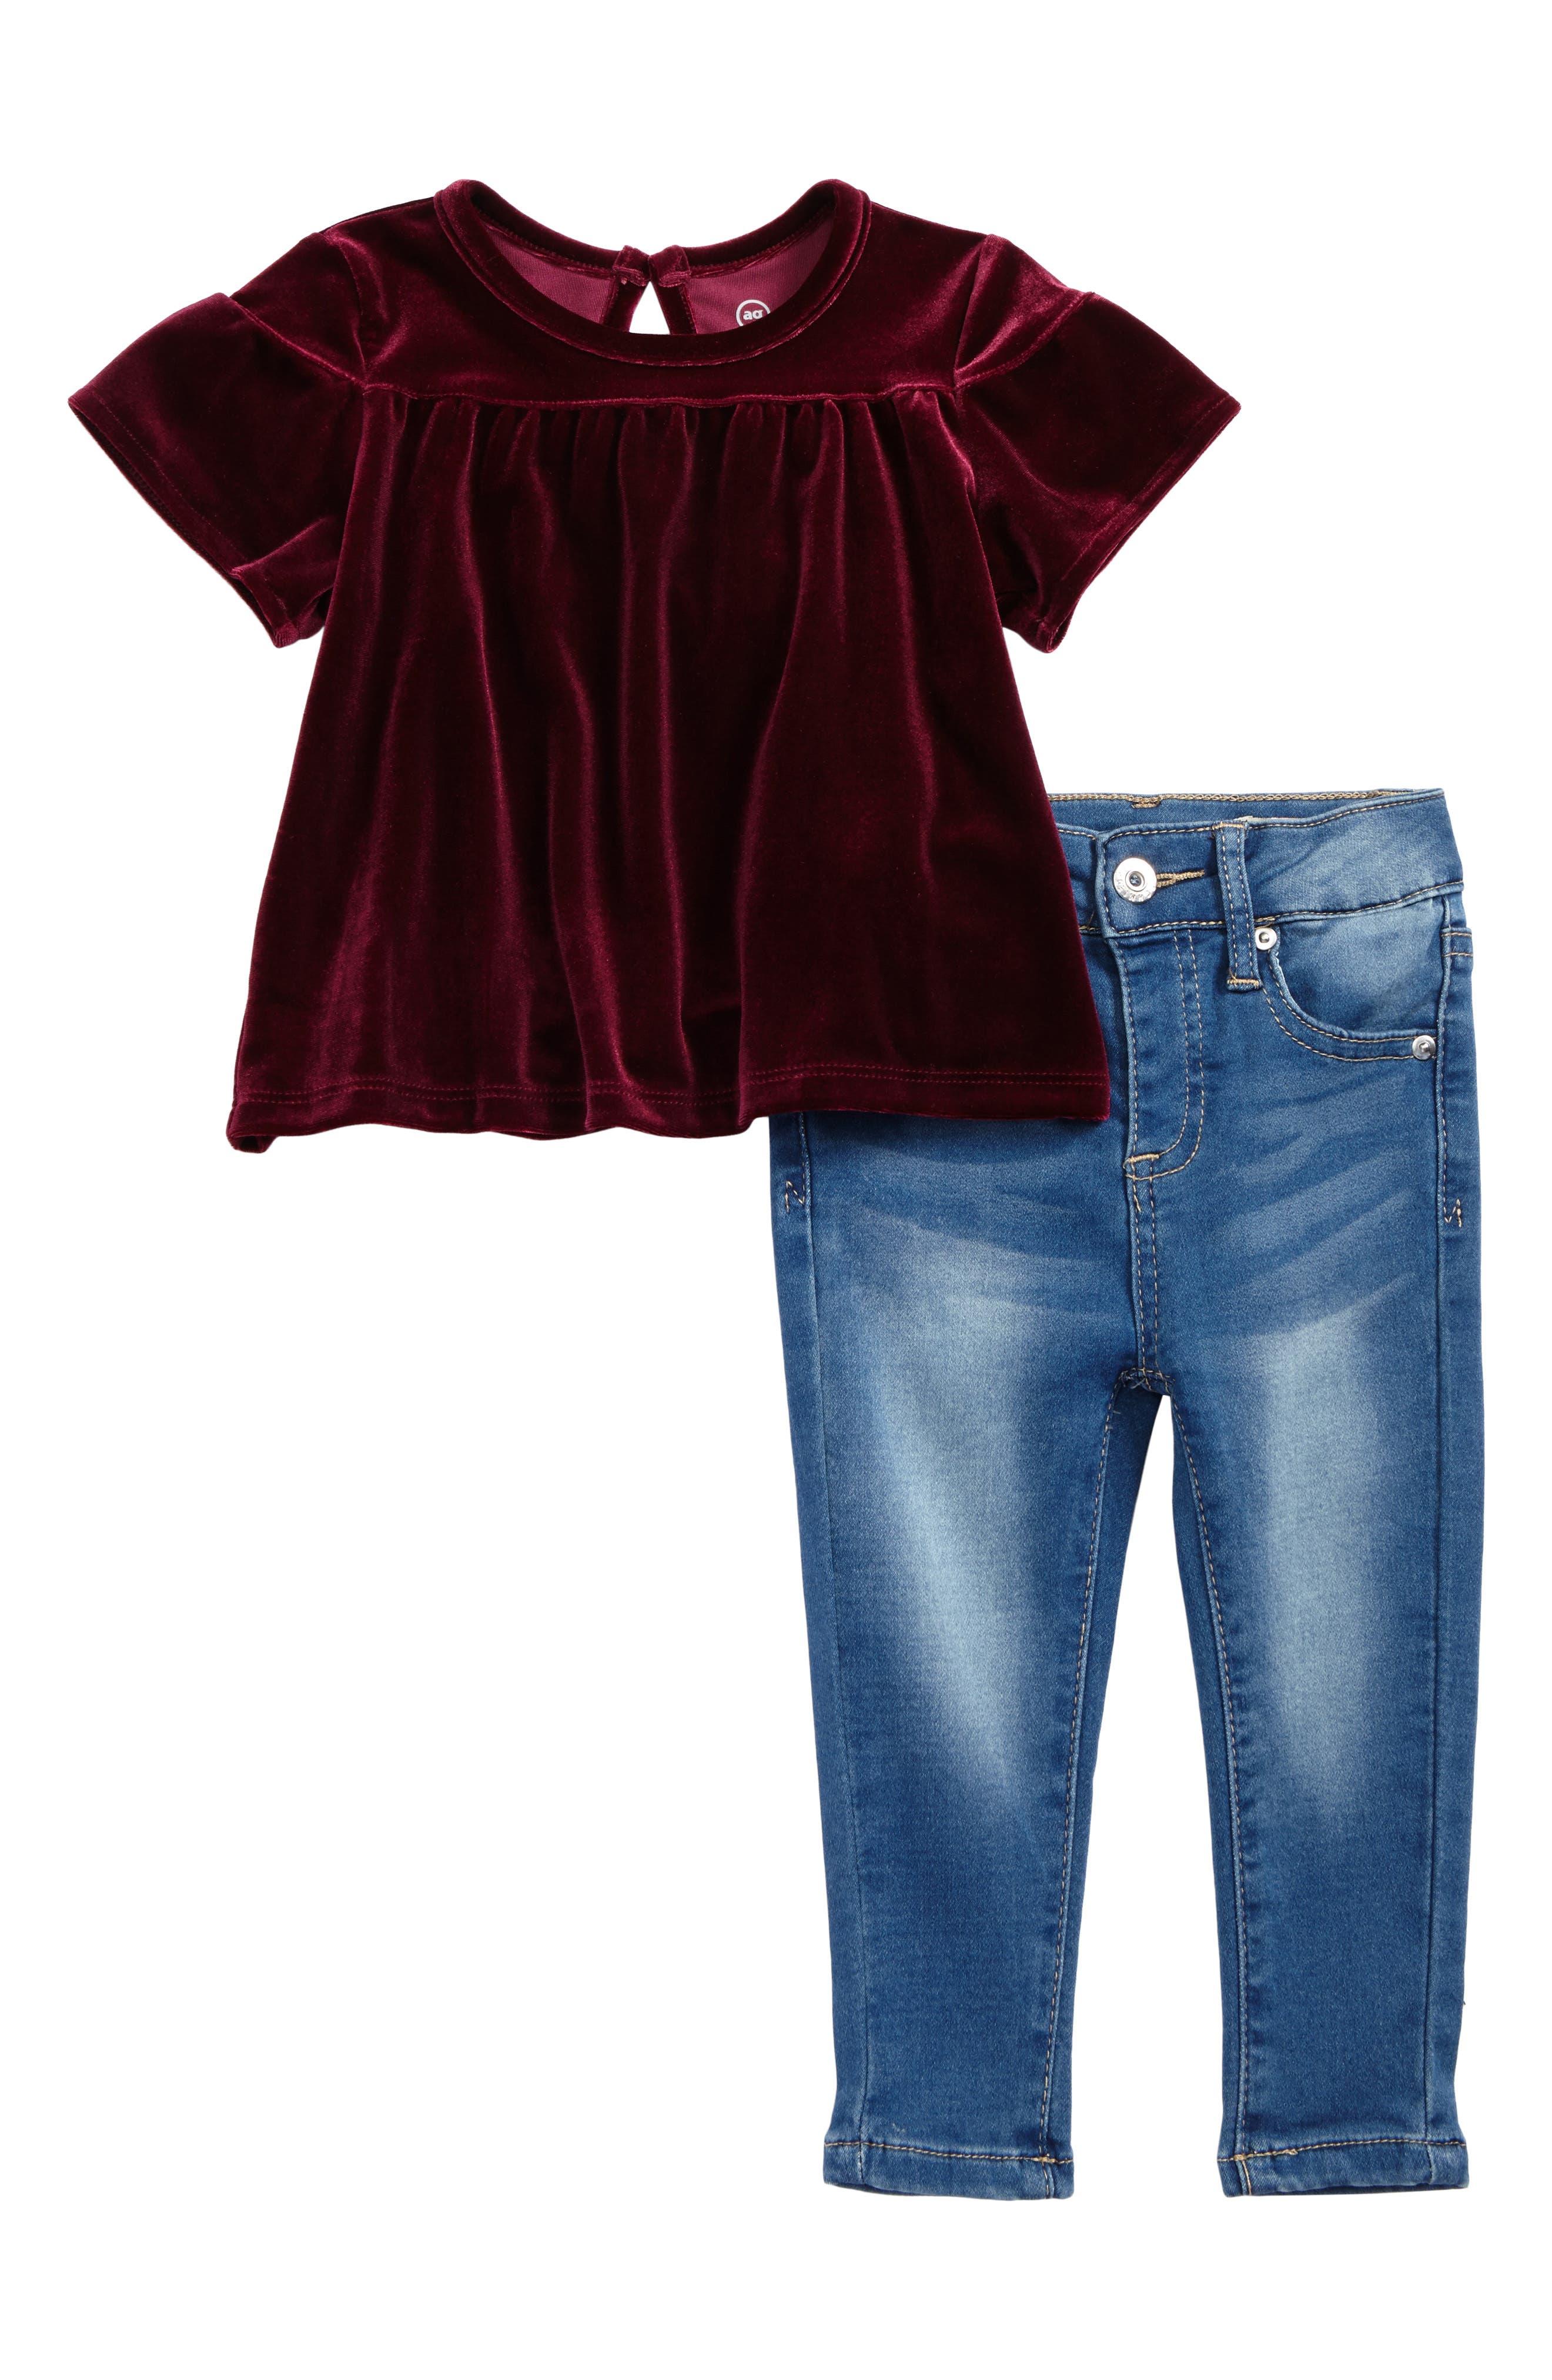 Main Image - ag adriano goldschmied kids Velvet Top & Knit Jeans Set (Baby Girls)